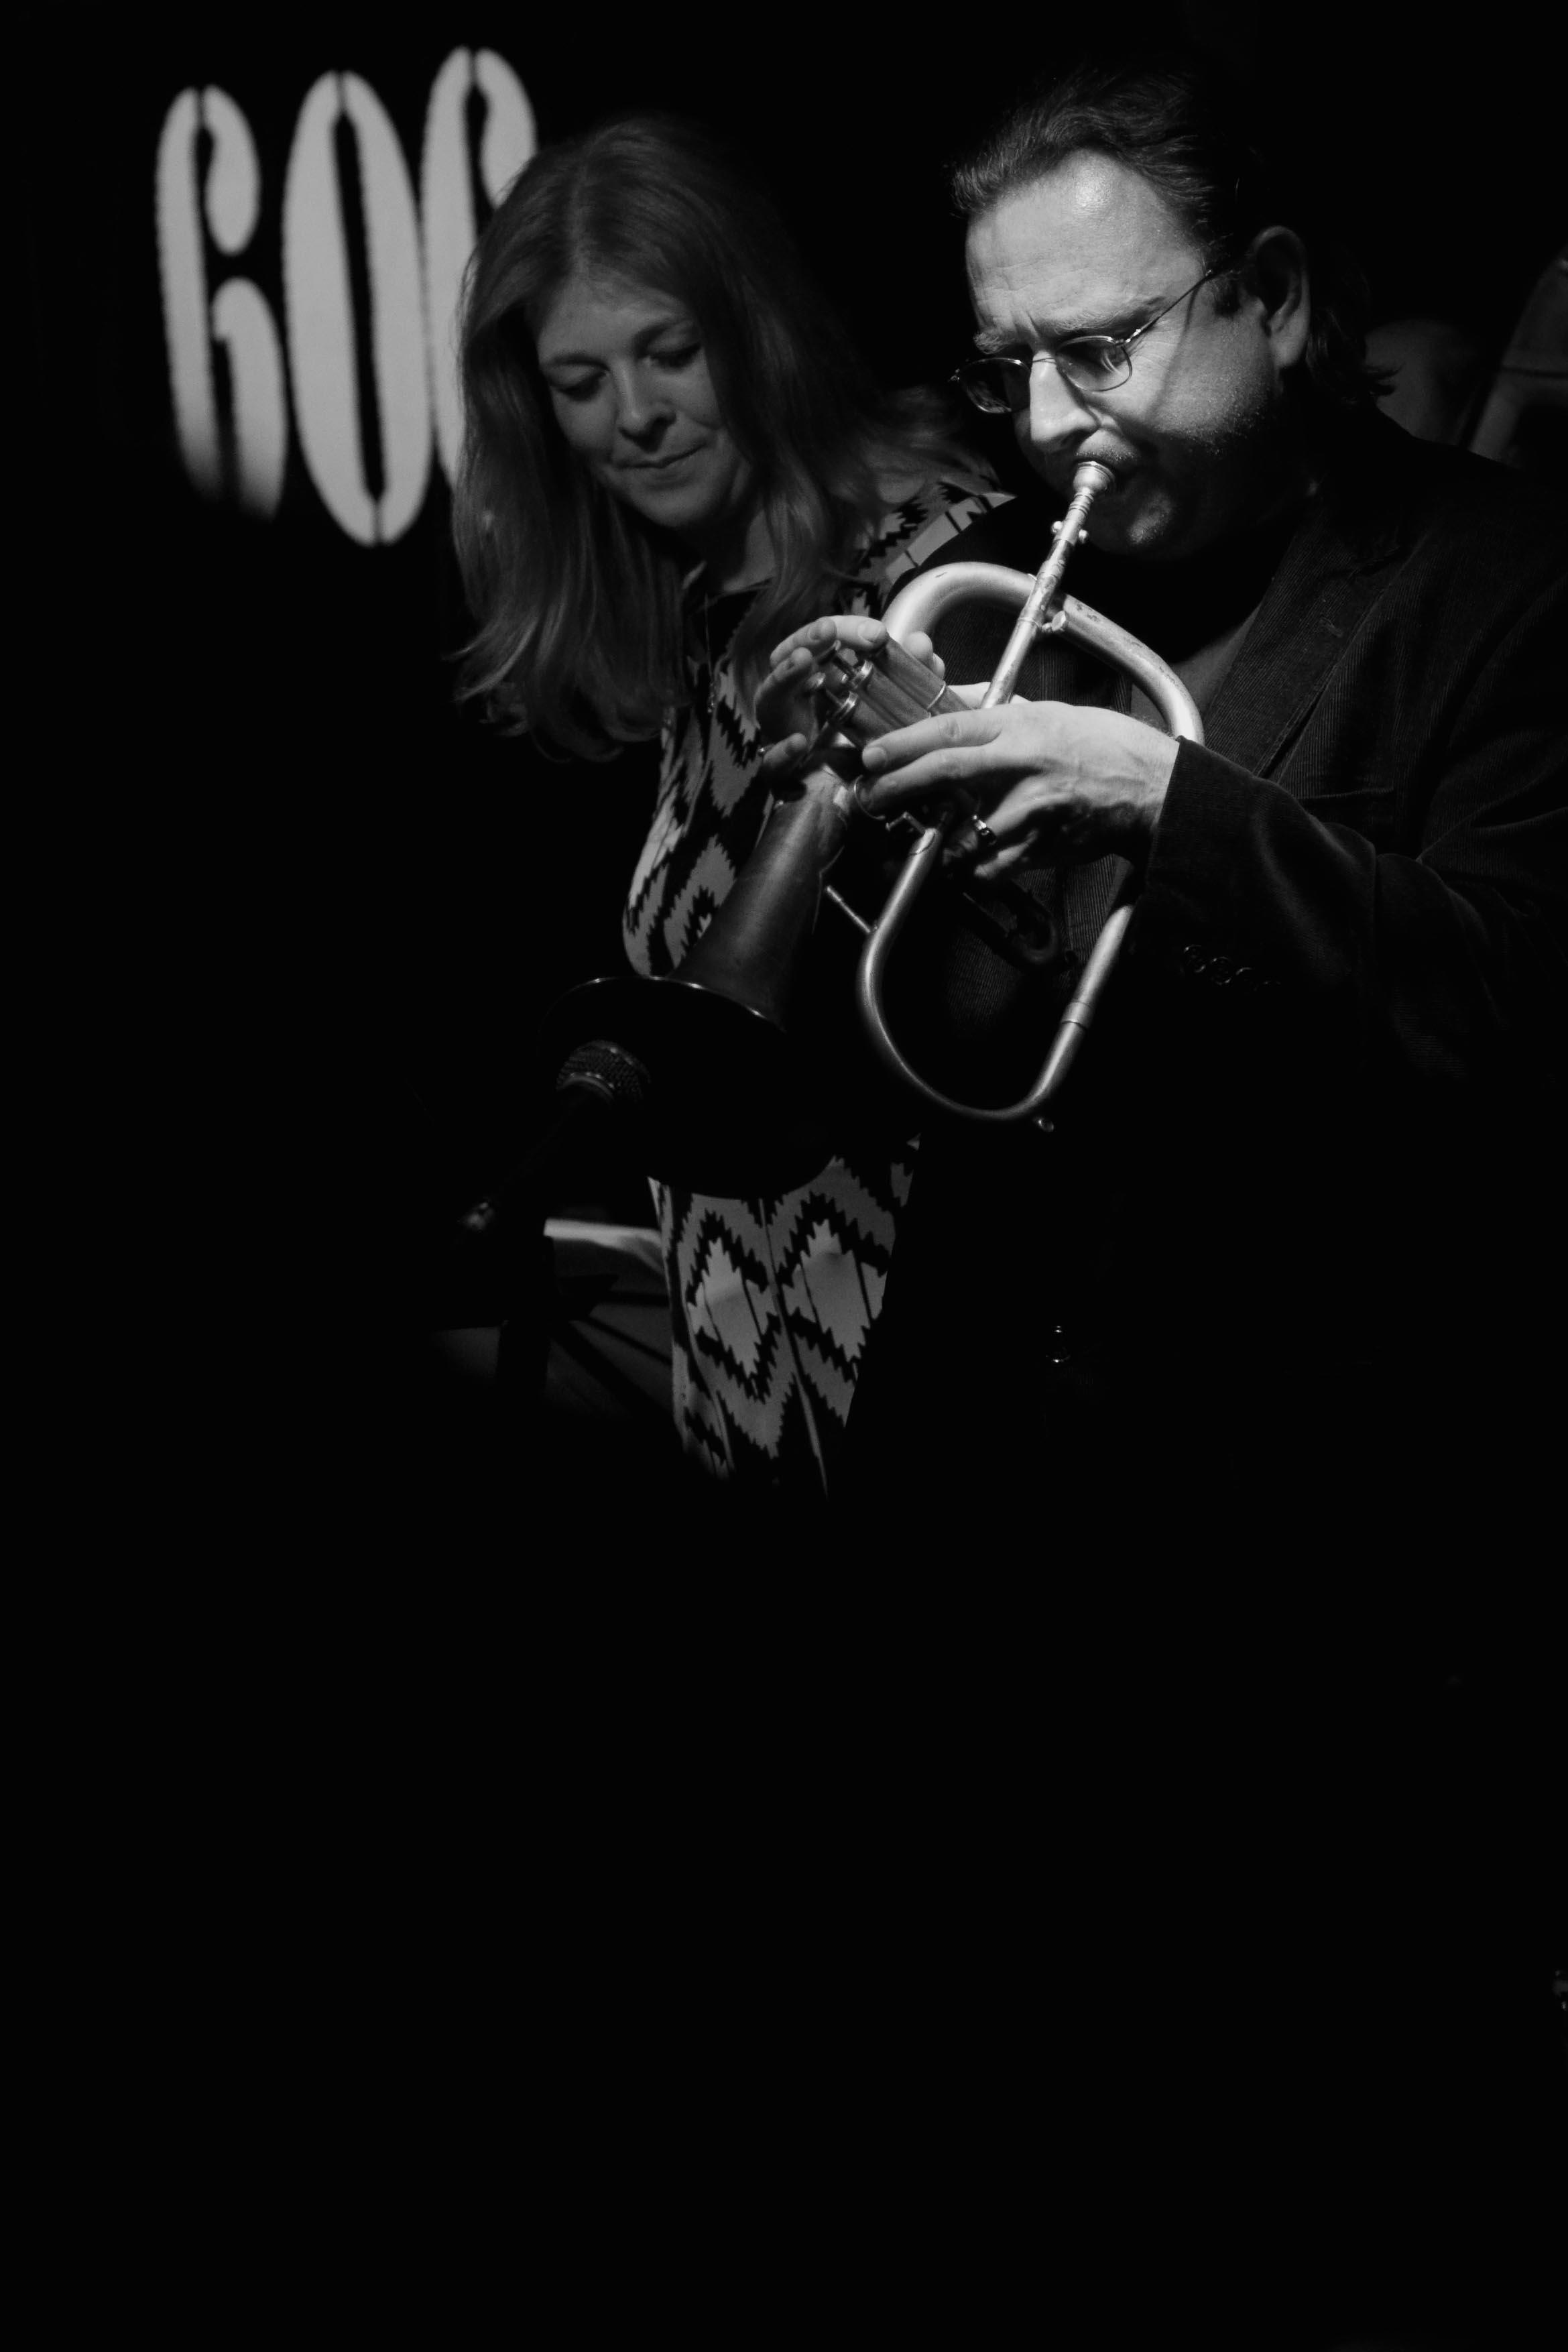 Martin Shaw and Jacqui Hicks